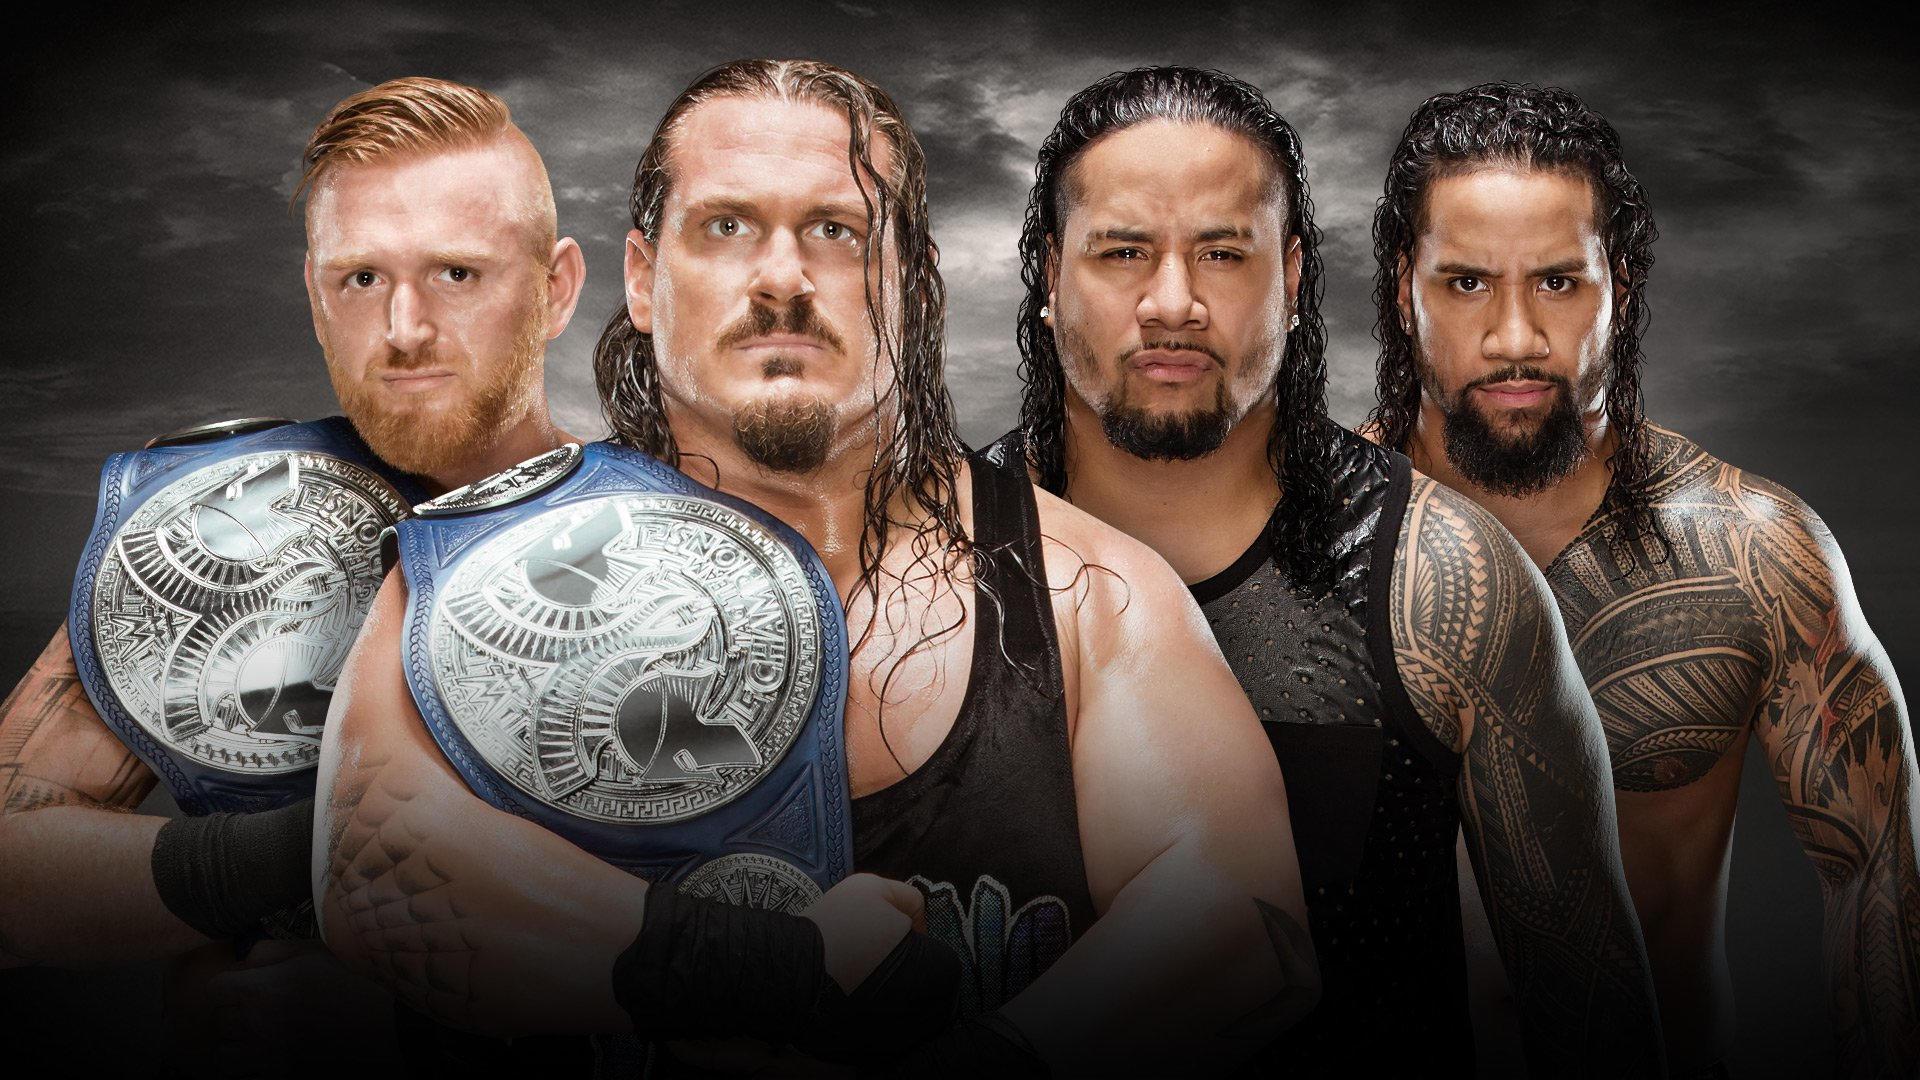 WWE NO MERCY - OCTOBER 9 - SACRAMENTO, CALIFORNIA 20160923_Nomercy_tagteam--1a25538ba9d61ae2589cf59d1de81343